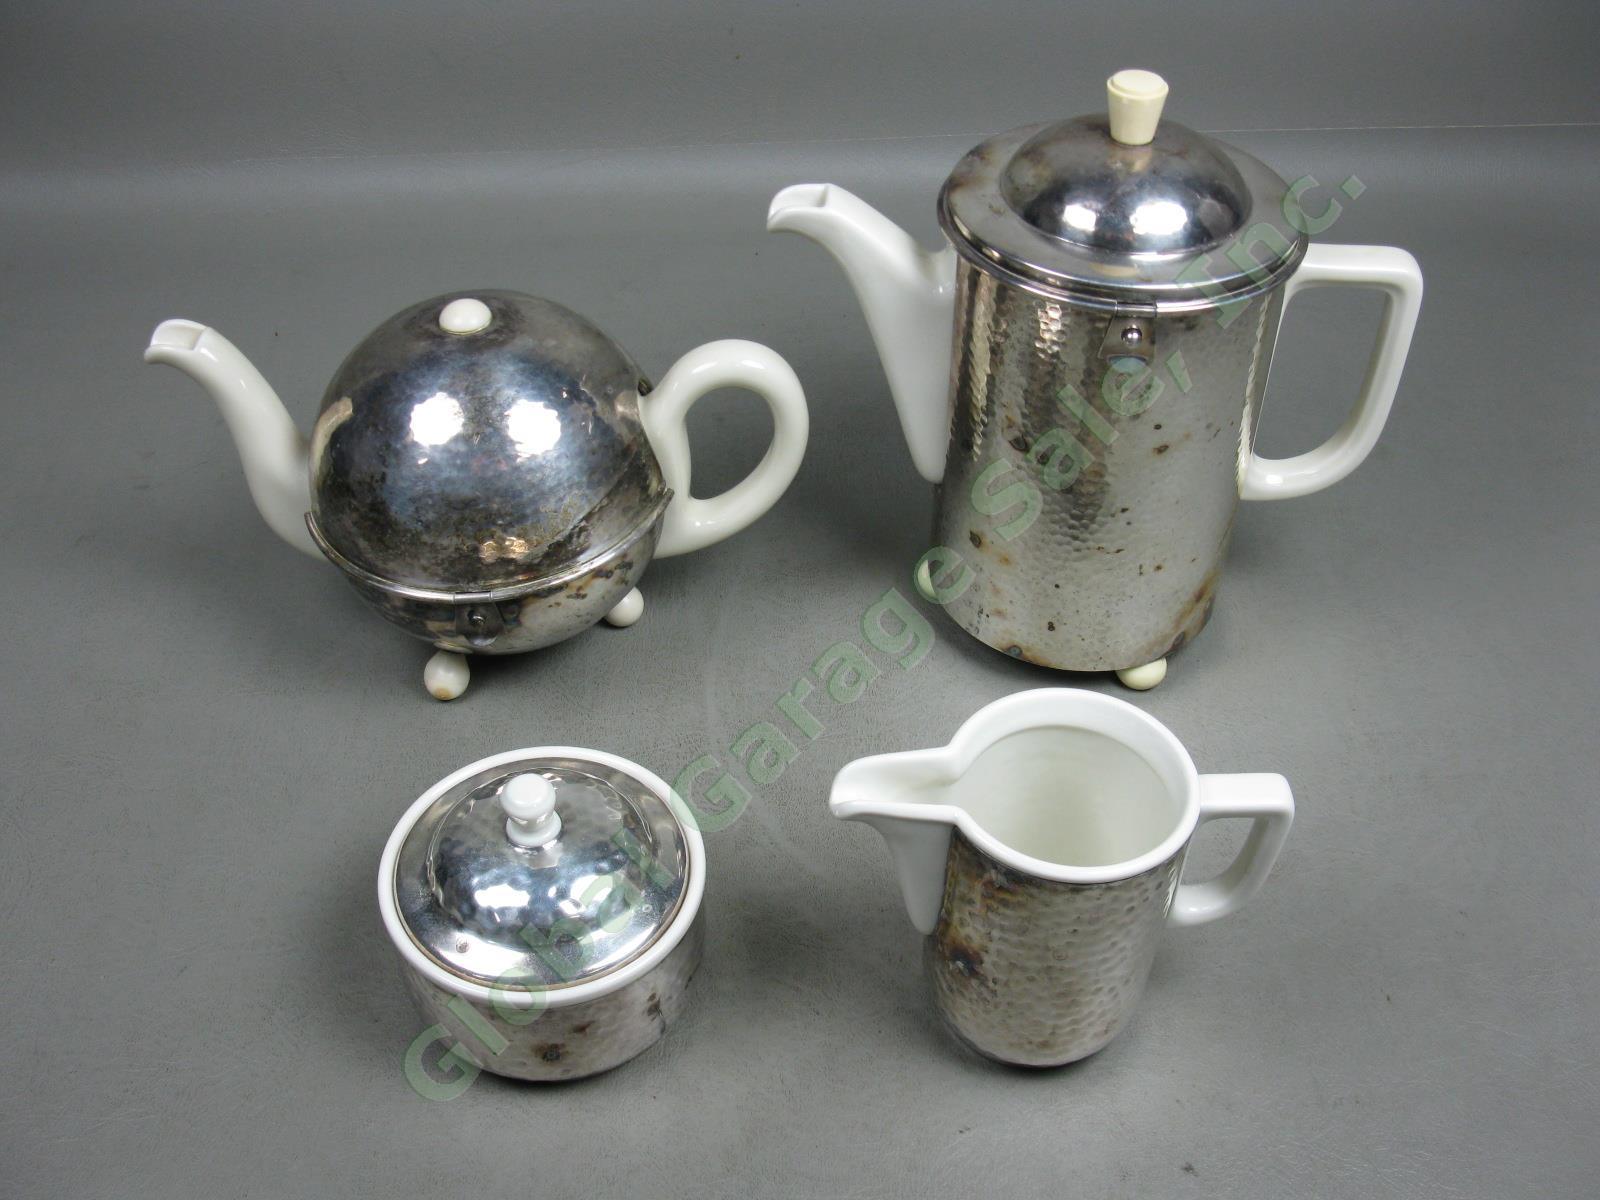 vtg wmf bauscher weiden hammered silverplate ceramic coffee tea set pot creamer ebay. Black Bedroom Furniture Sets. Home Design Ideas